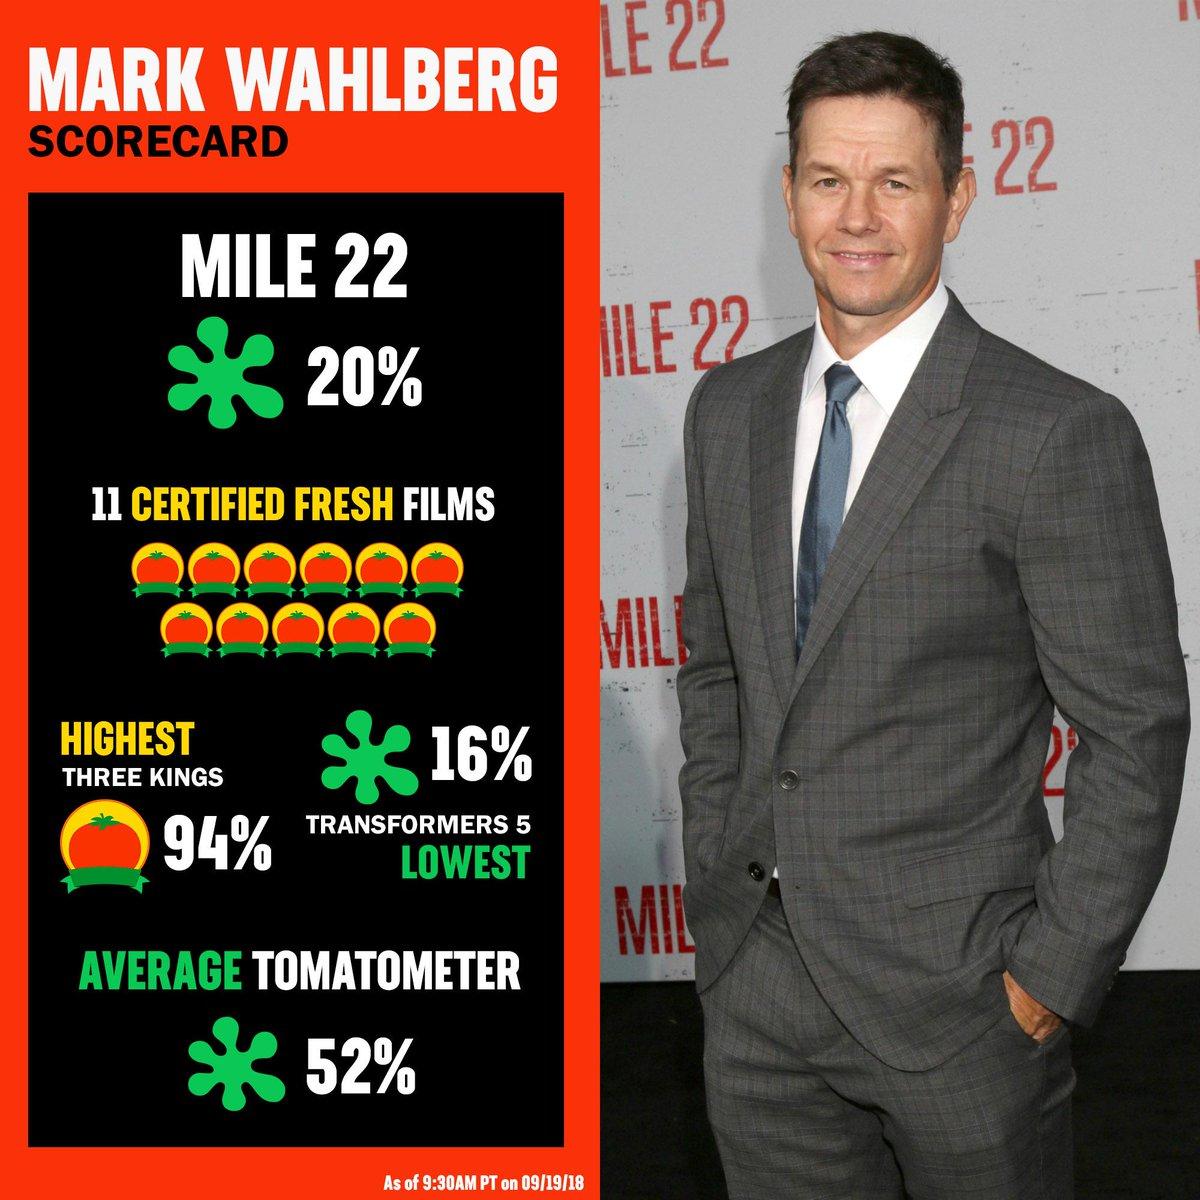 Rotten Tomatoes On Twitter Mark Wahlberg S Acting Scorecard